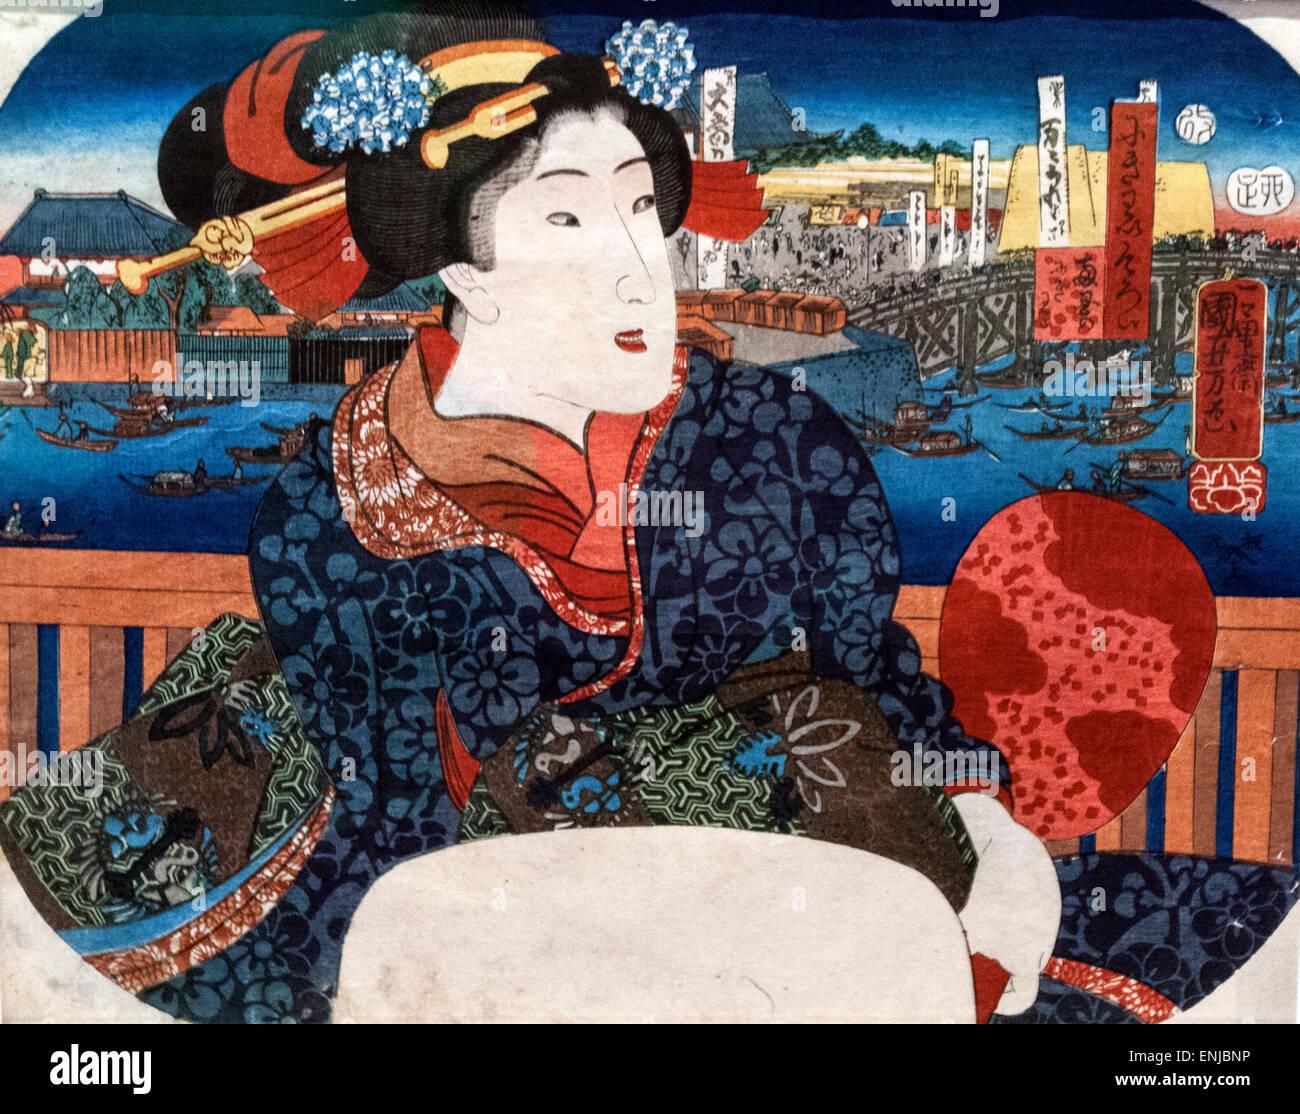 Exciting Places: Ryogoku, by Utagawa Kuniyoshi, Edo period, The Tokyo National Museum, or TNM, - Stock Image